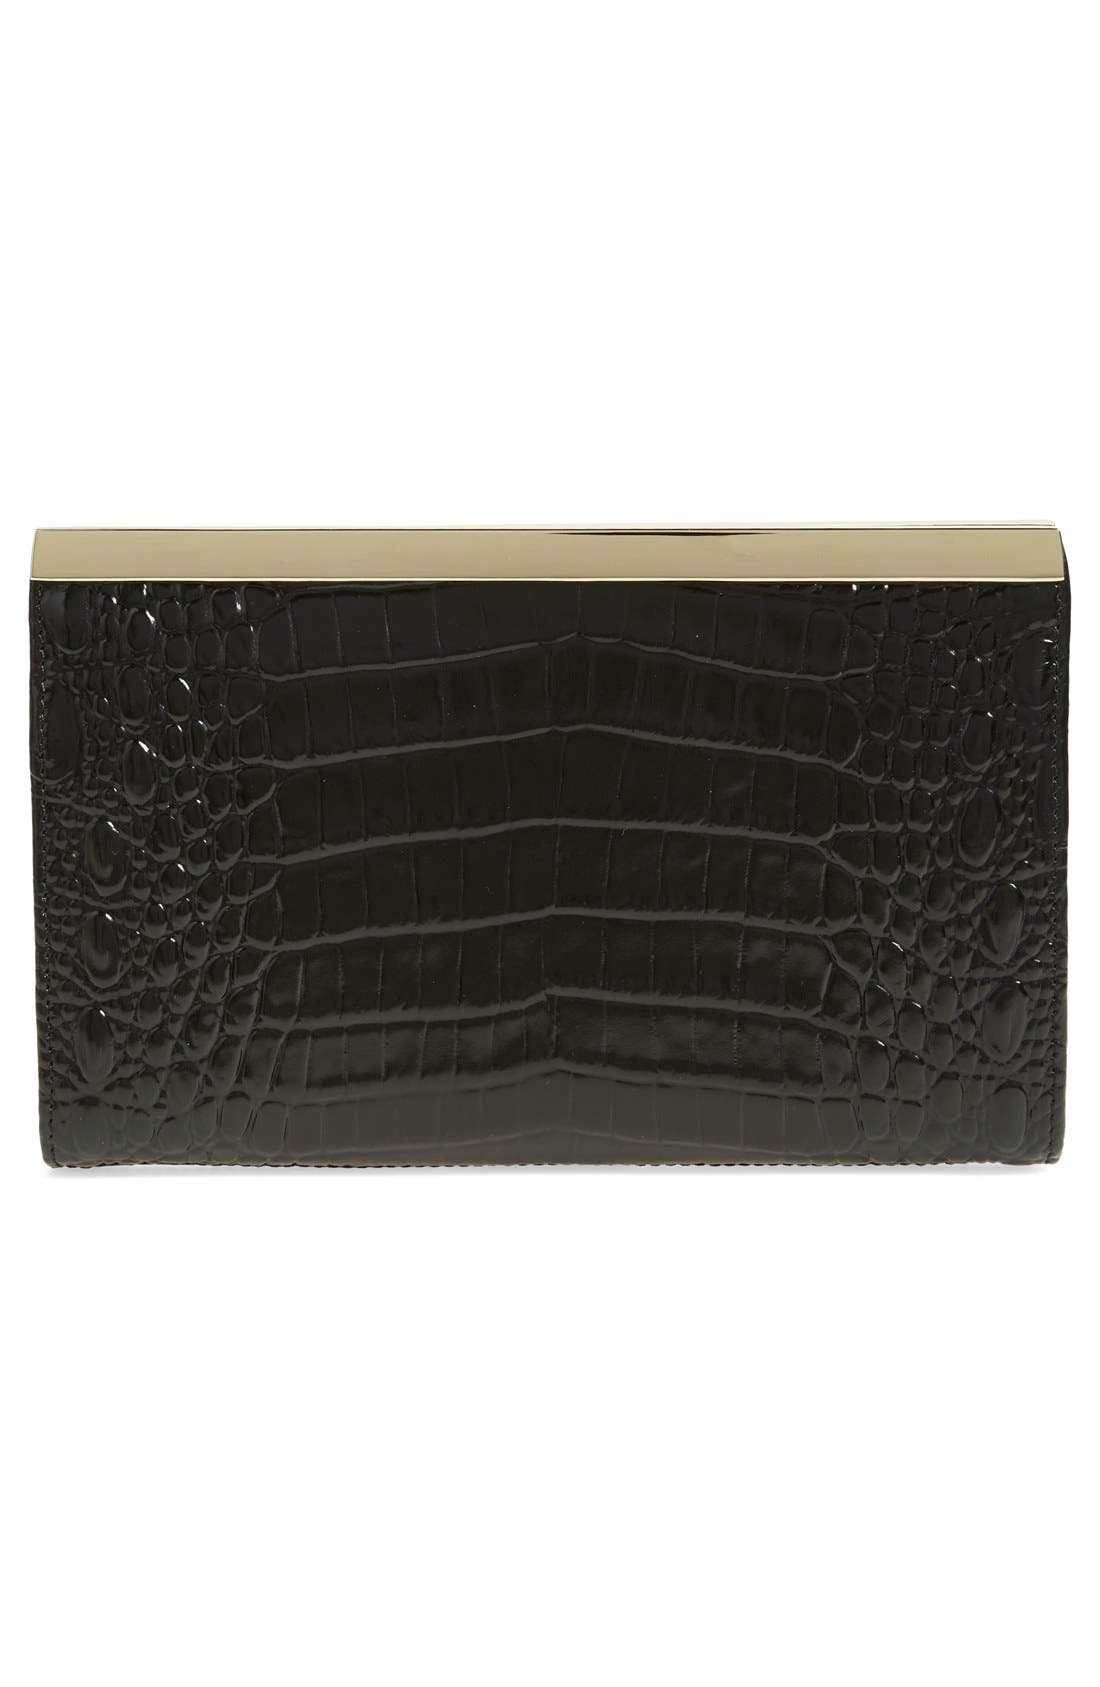 'Tillie' Croc Embossed Leather Clutch,                             Alternate thumbnail 3, color,                             Onyx